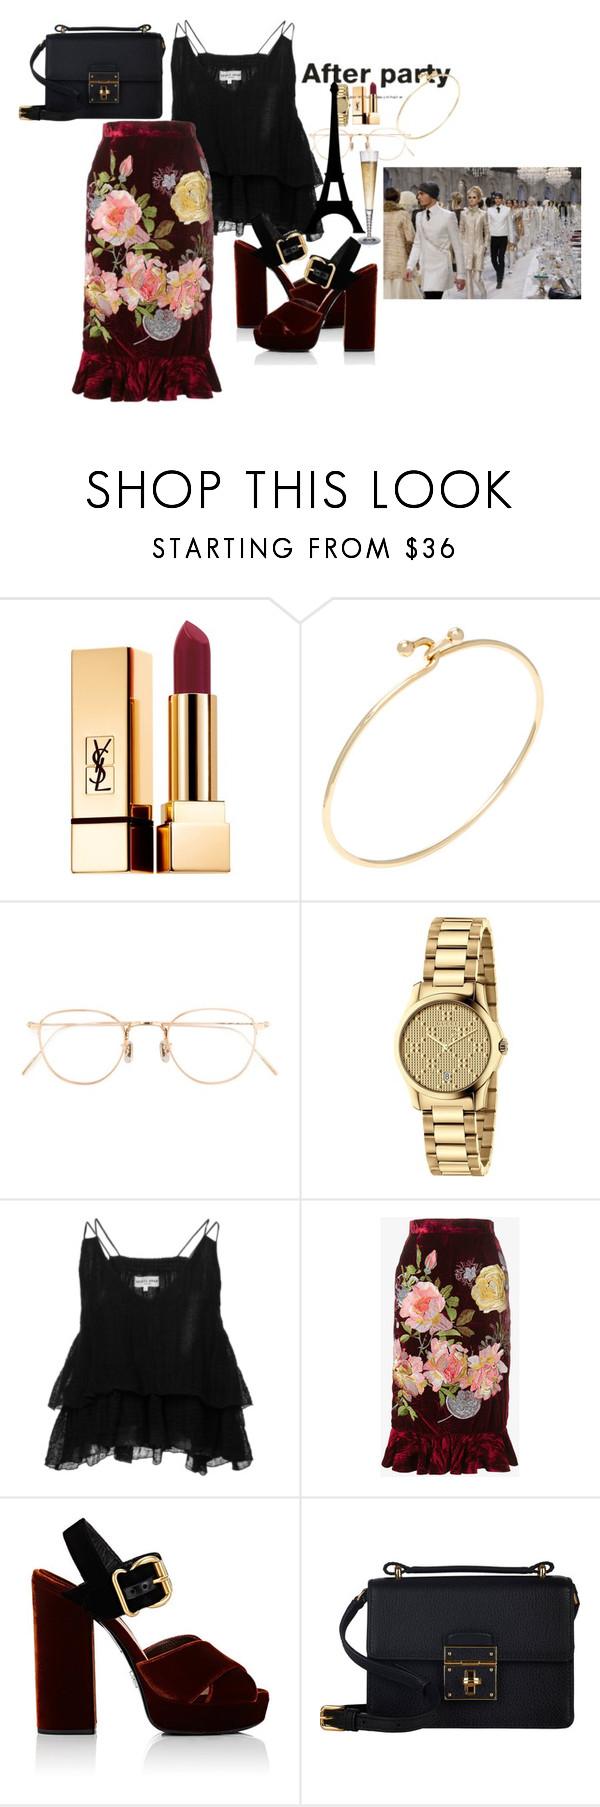 """Başlıksız #889"" by suana123 on Polyvore featuring moda, Yves Saint Laurent, Tiffany & Co., Eyevan 7285, Gucci, Apiece Apart, Alice Archer, Prada ve Dolce&Gabbana"